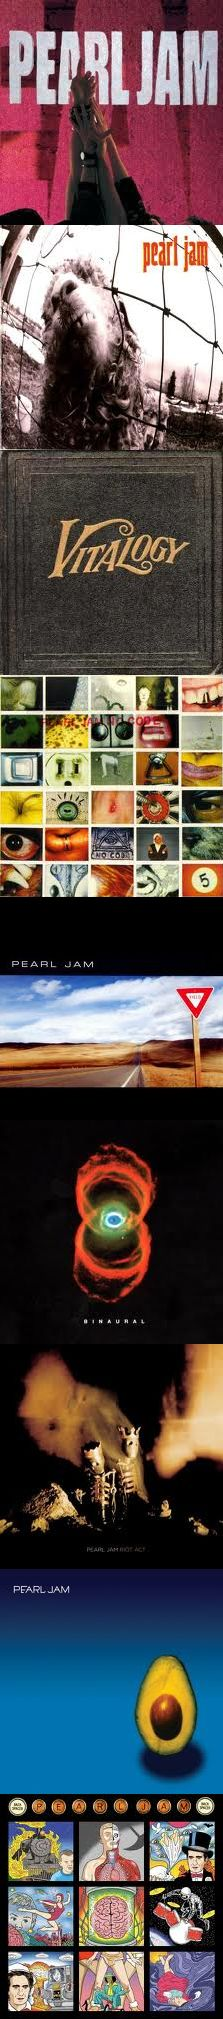 EPIC ALBUM, life changing! Pearl Jam 10